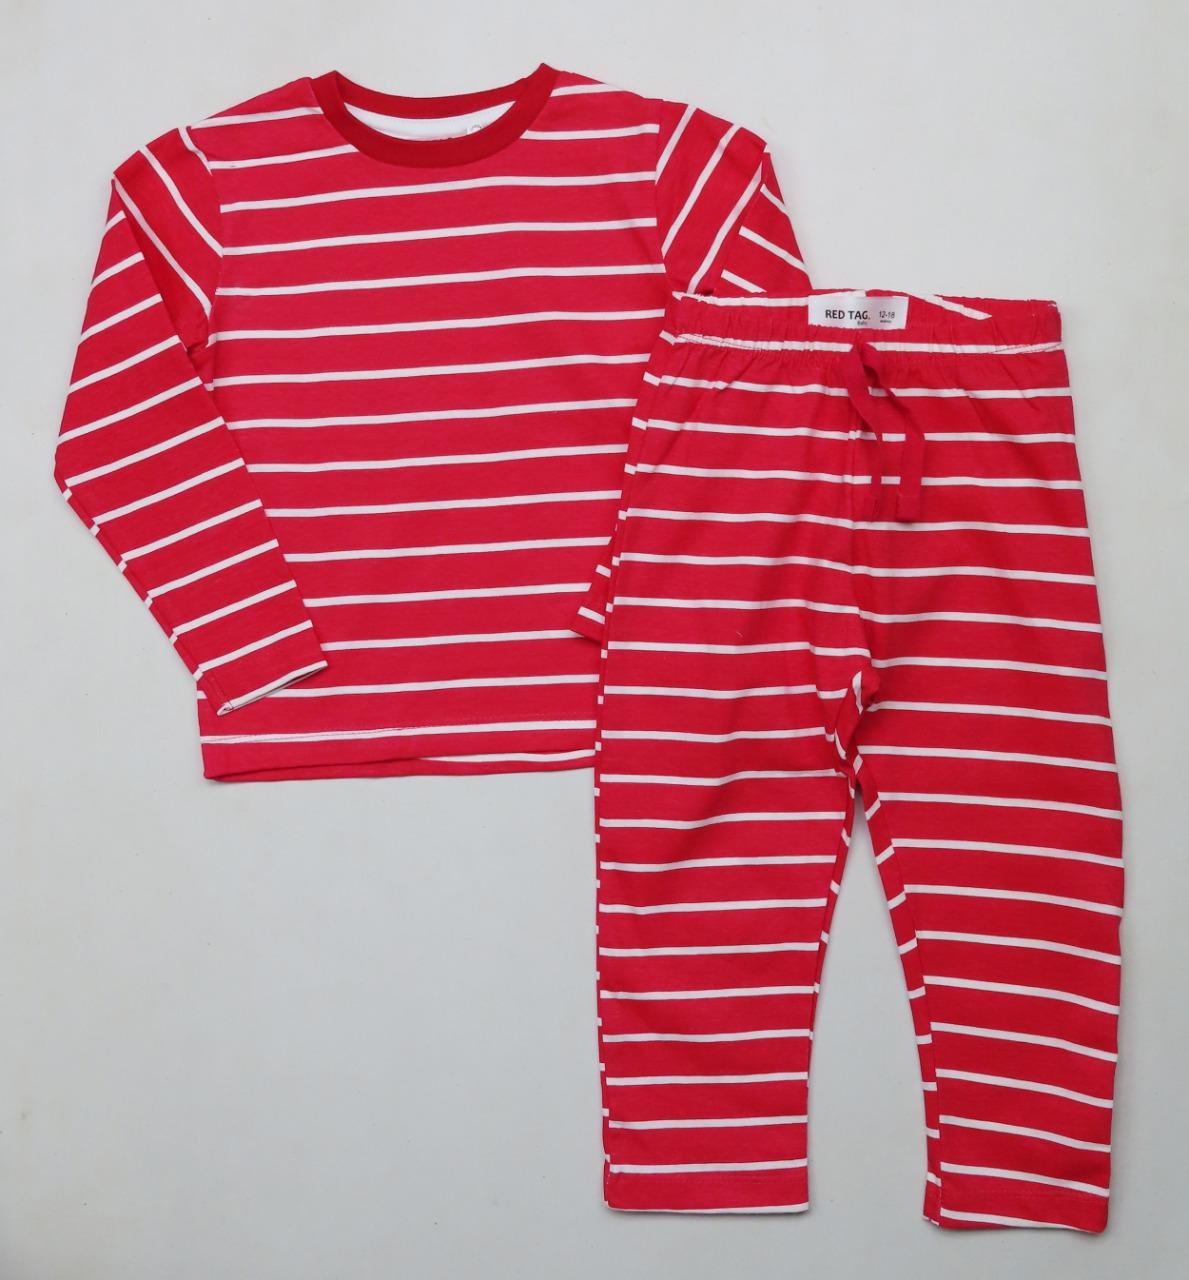 Baby Boys Striped Pyjama Sets